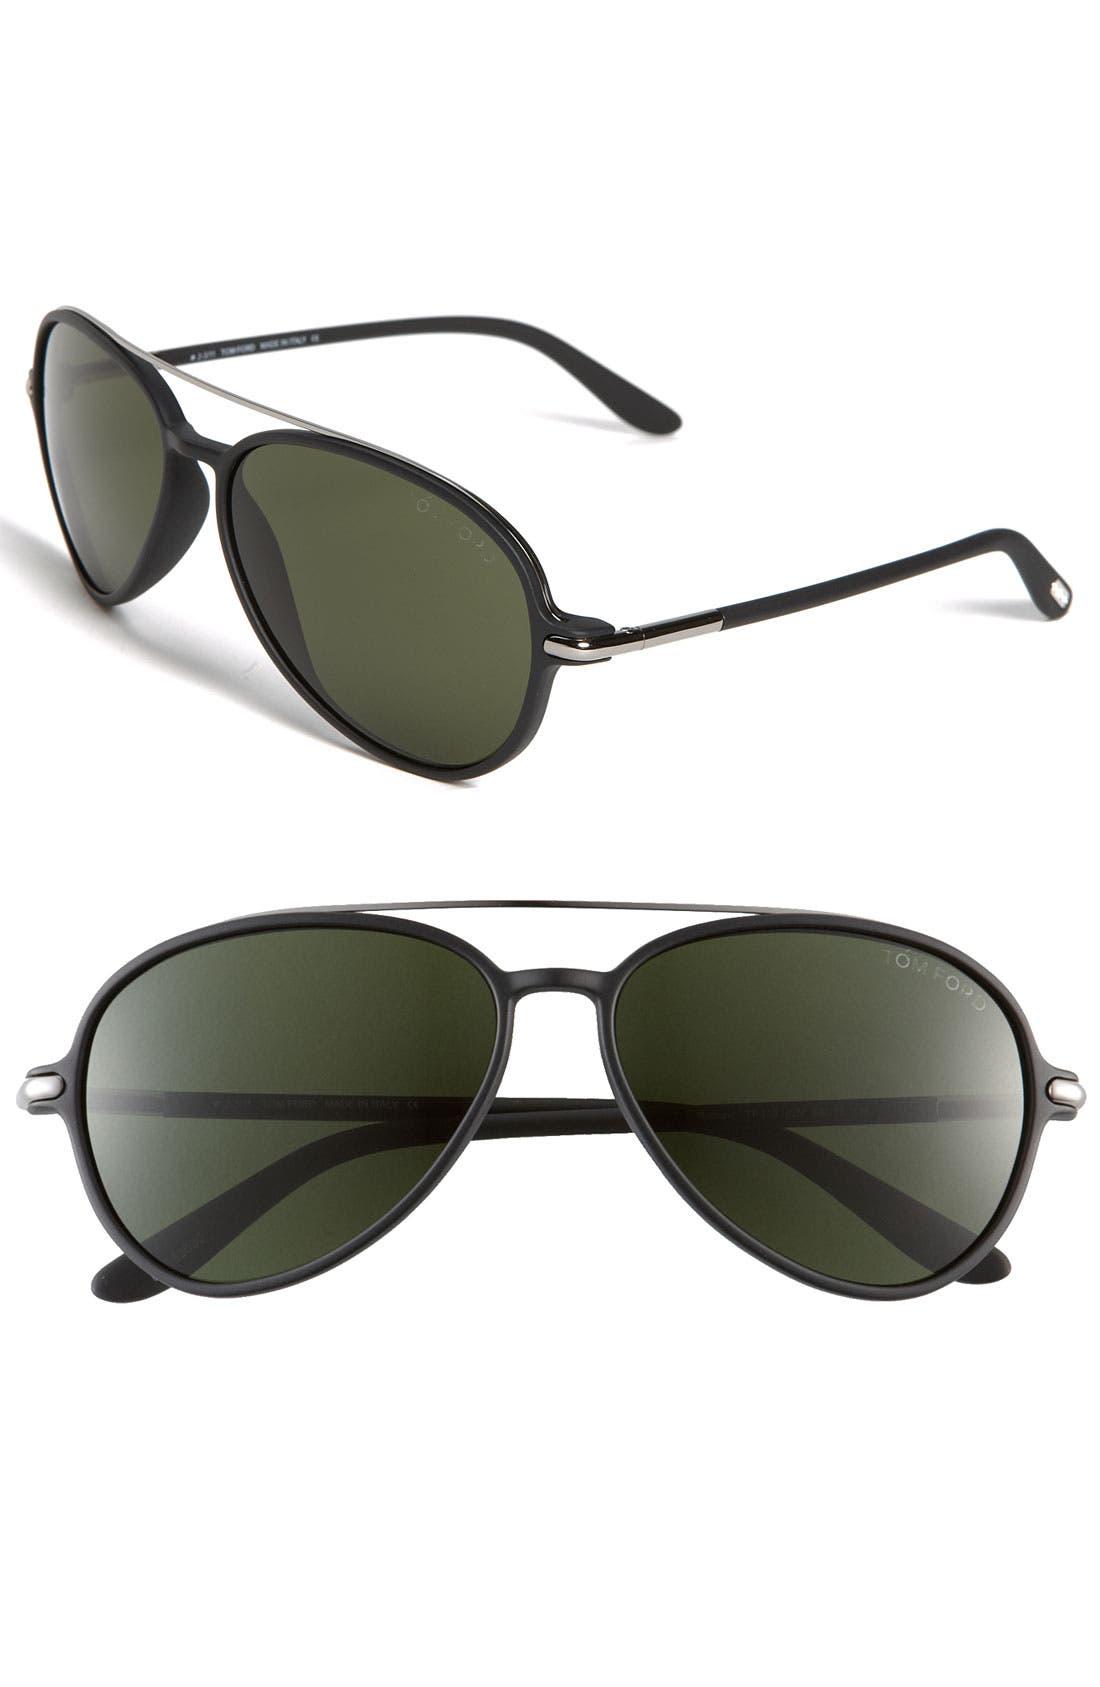 Main Image - Tom Ford 'Ramone' 58mm Aviator Sunglasses